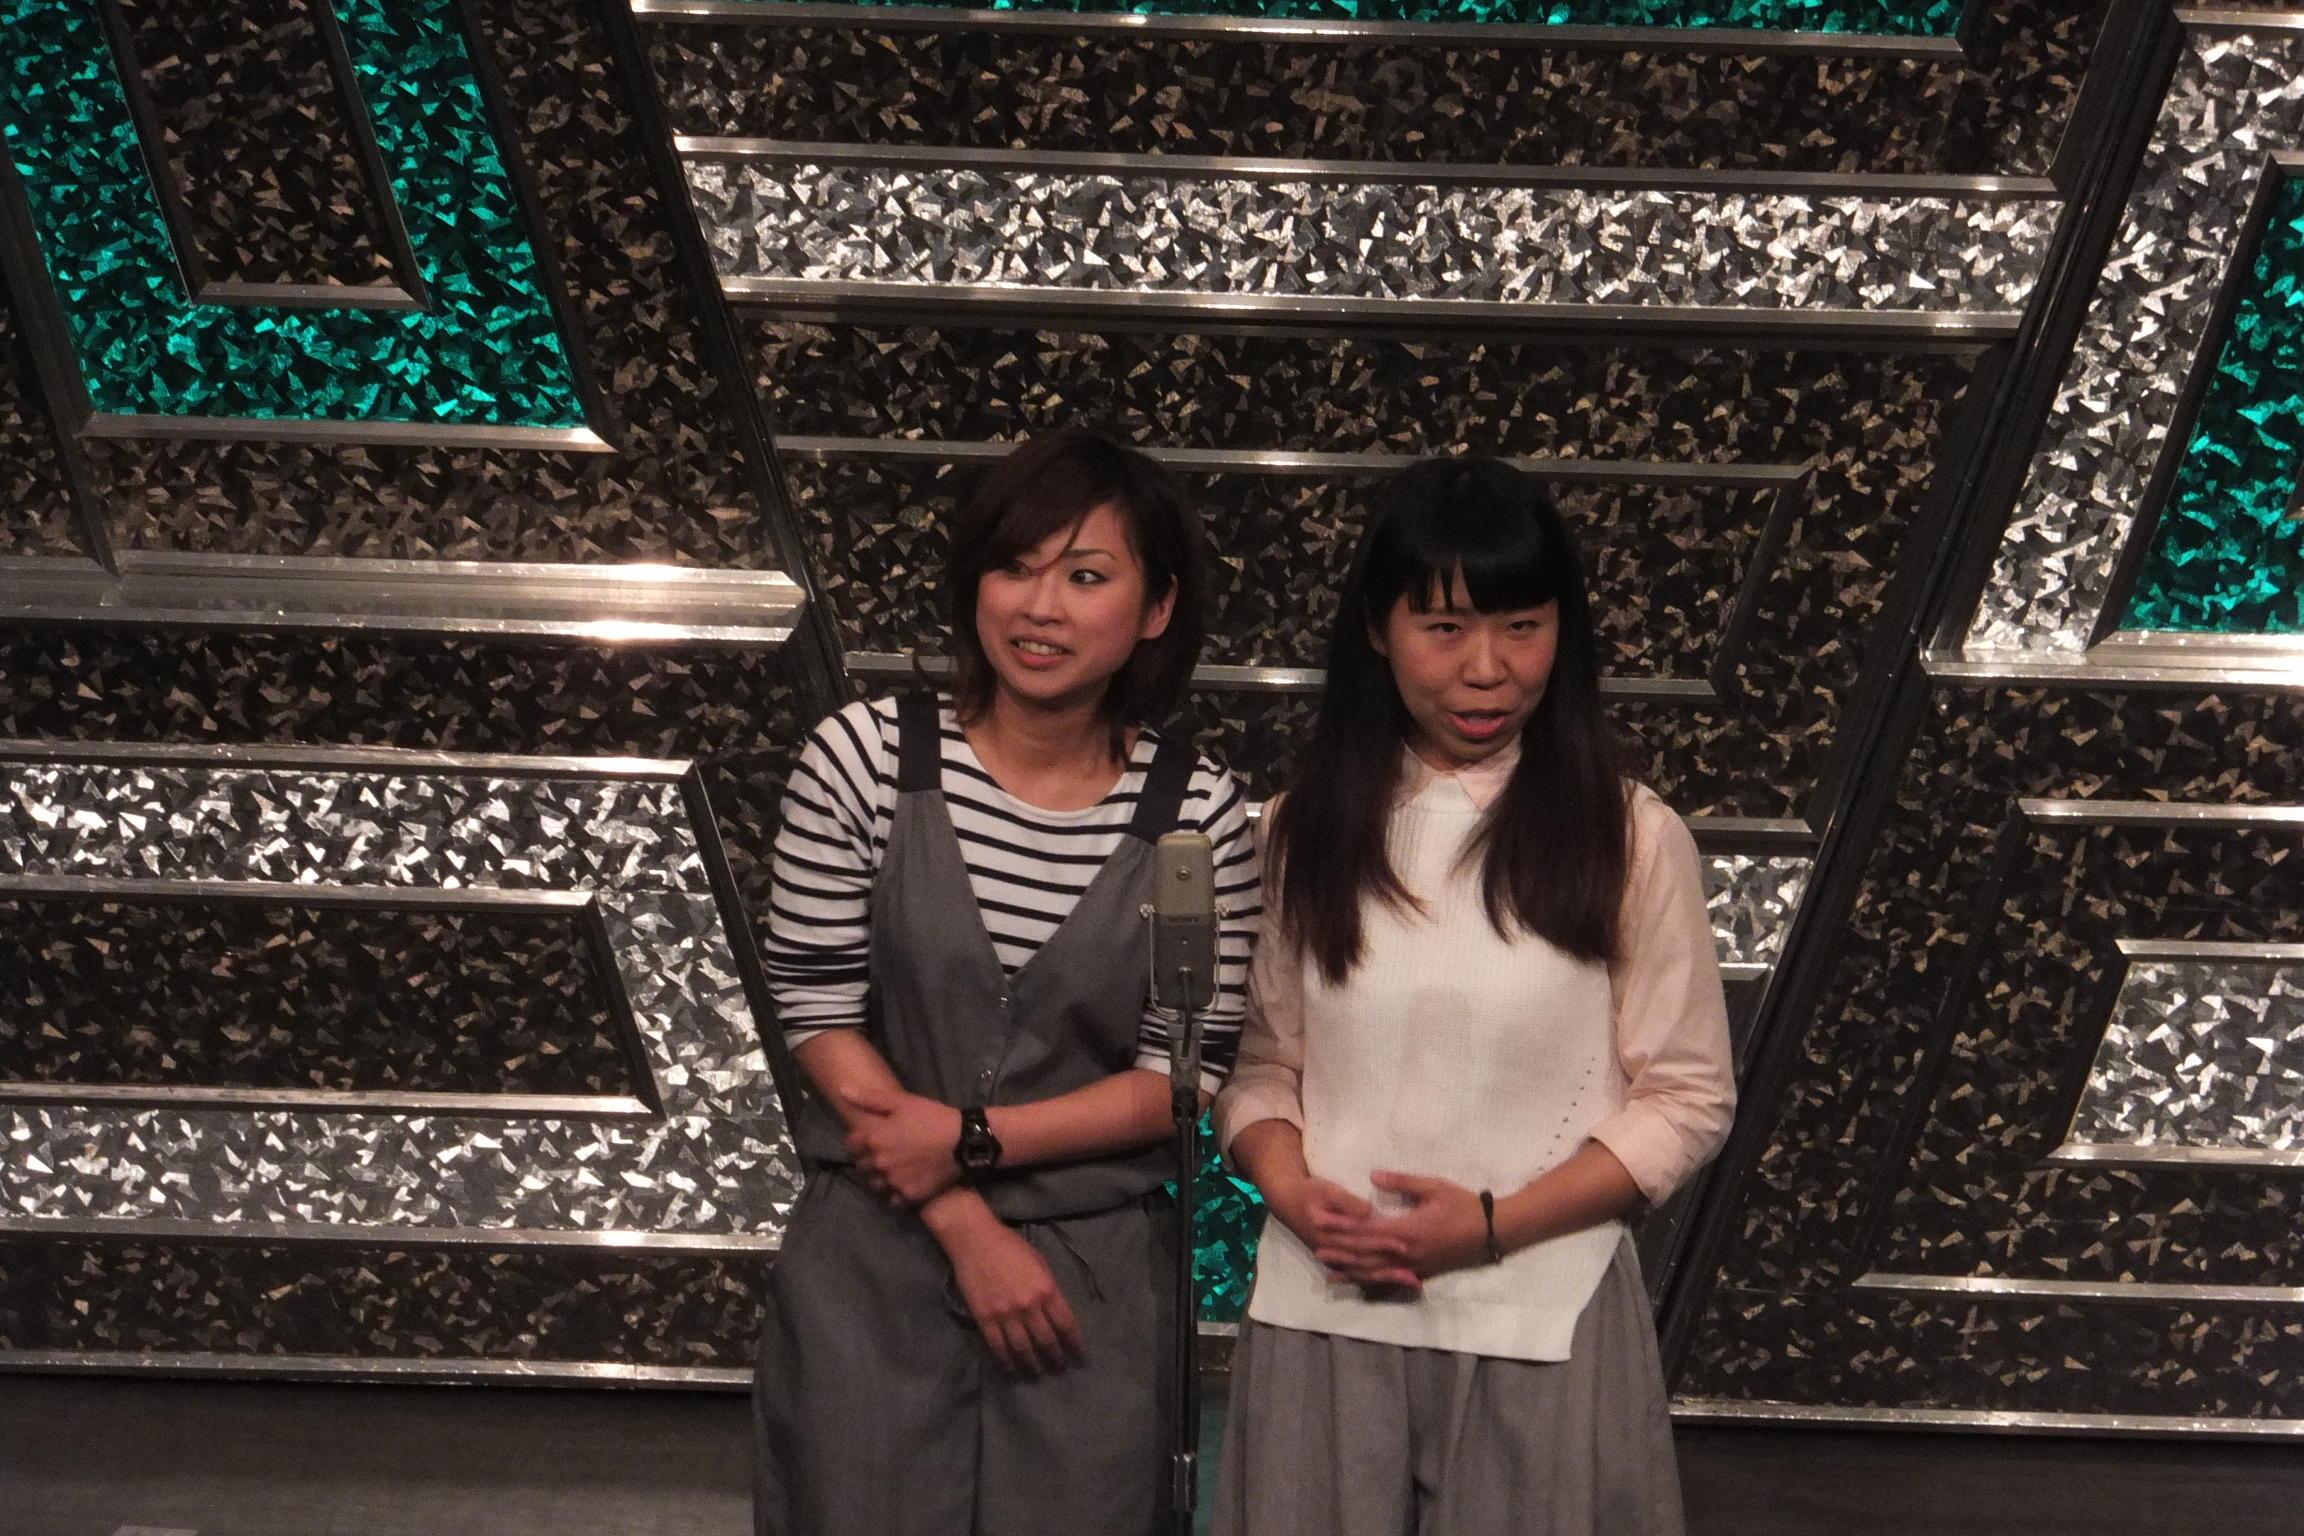 http://news.yoshimoto.co.jp/20160129151311-9b0004a2f03dcfbf20b8d612df180d38d5f10fff.jpg